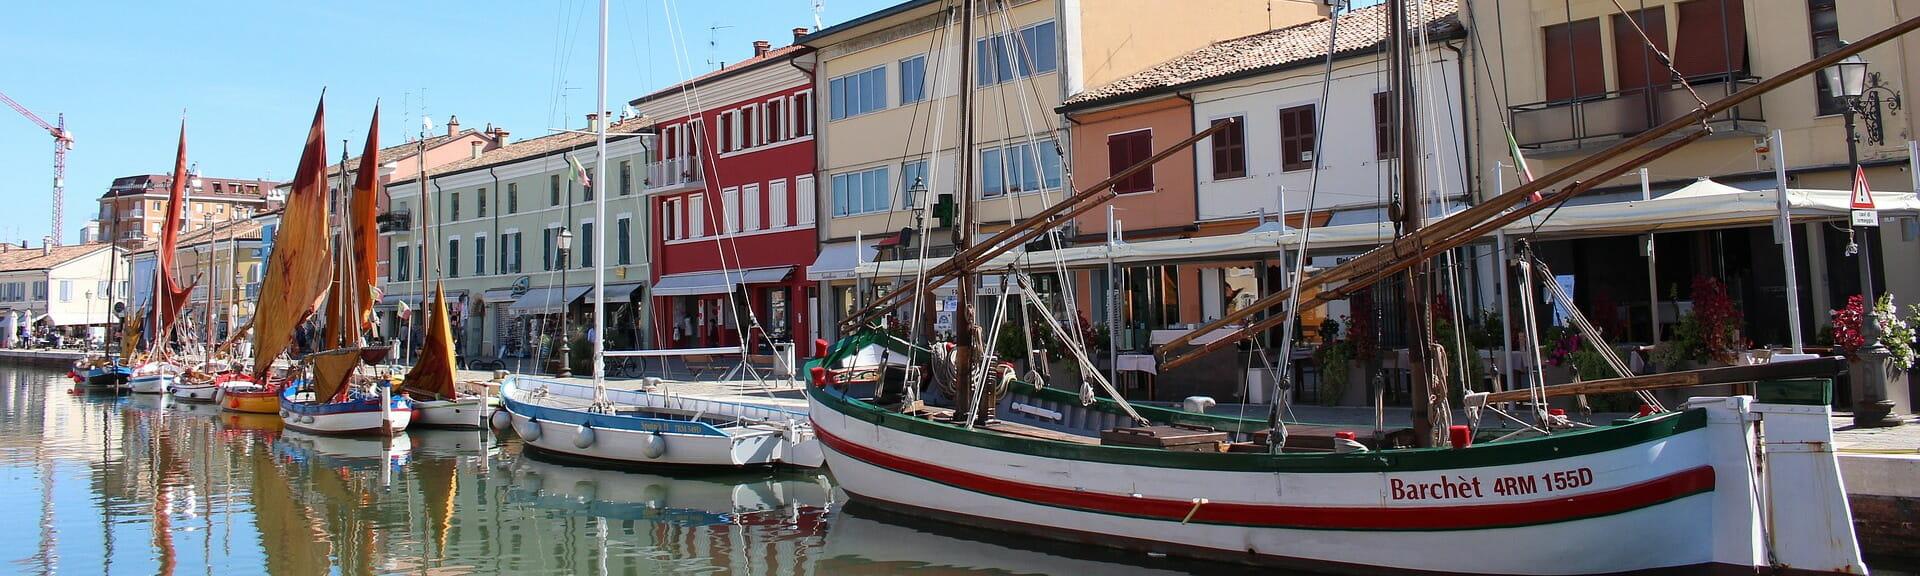 Klassenfahrt Emiglia Romagna Hafen